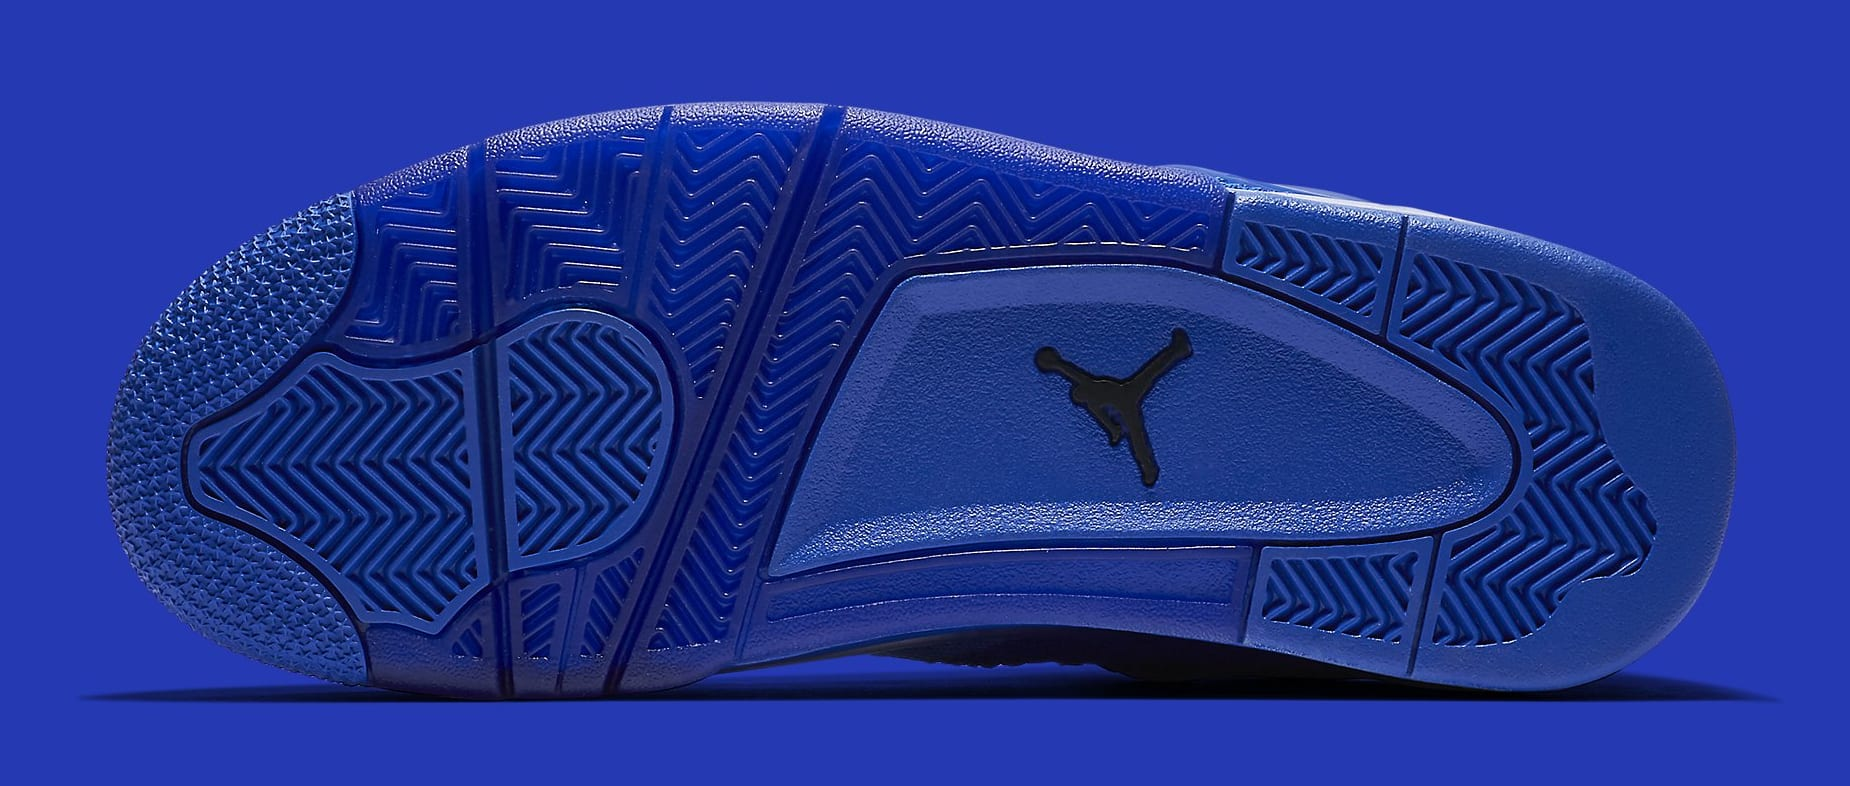 Air Jordan 4 Flyknit 'Game Royal' AQ3559-400 Sole